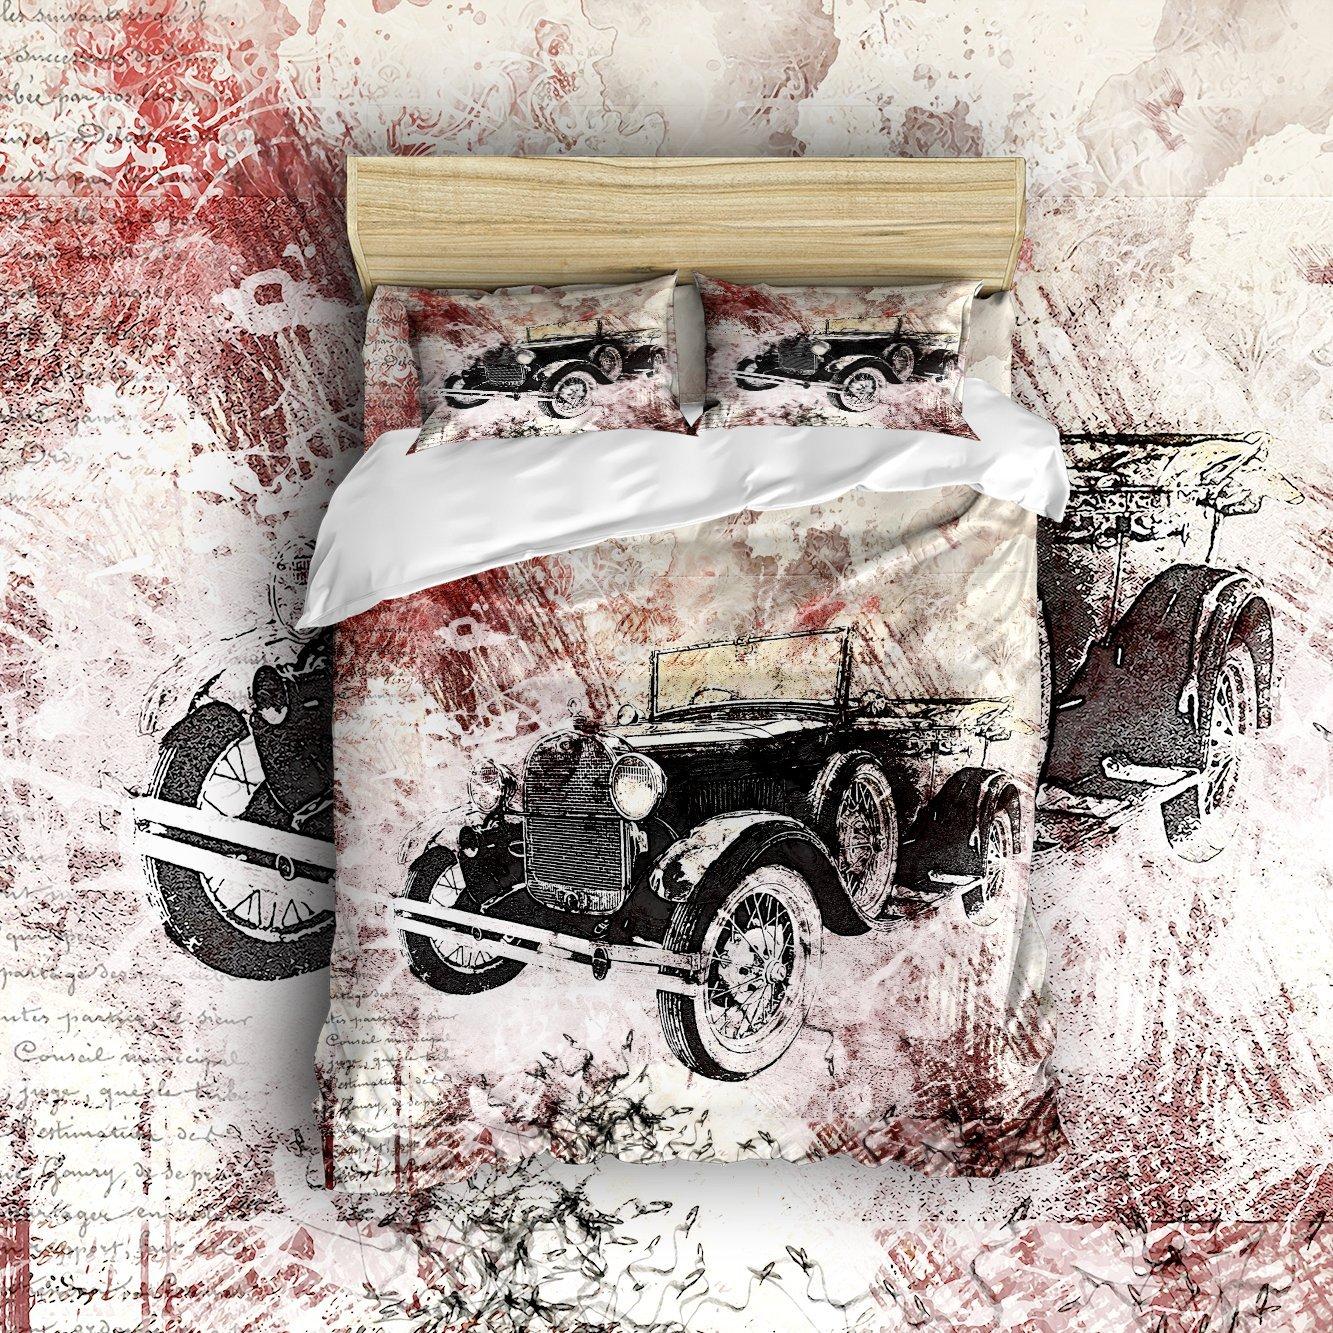 4 Piece Street Graffiti Vintage Cars Old Convertibles Bedding Comforter Set Wrinkle Resistant